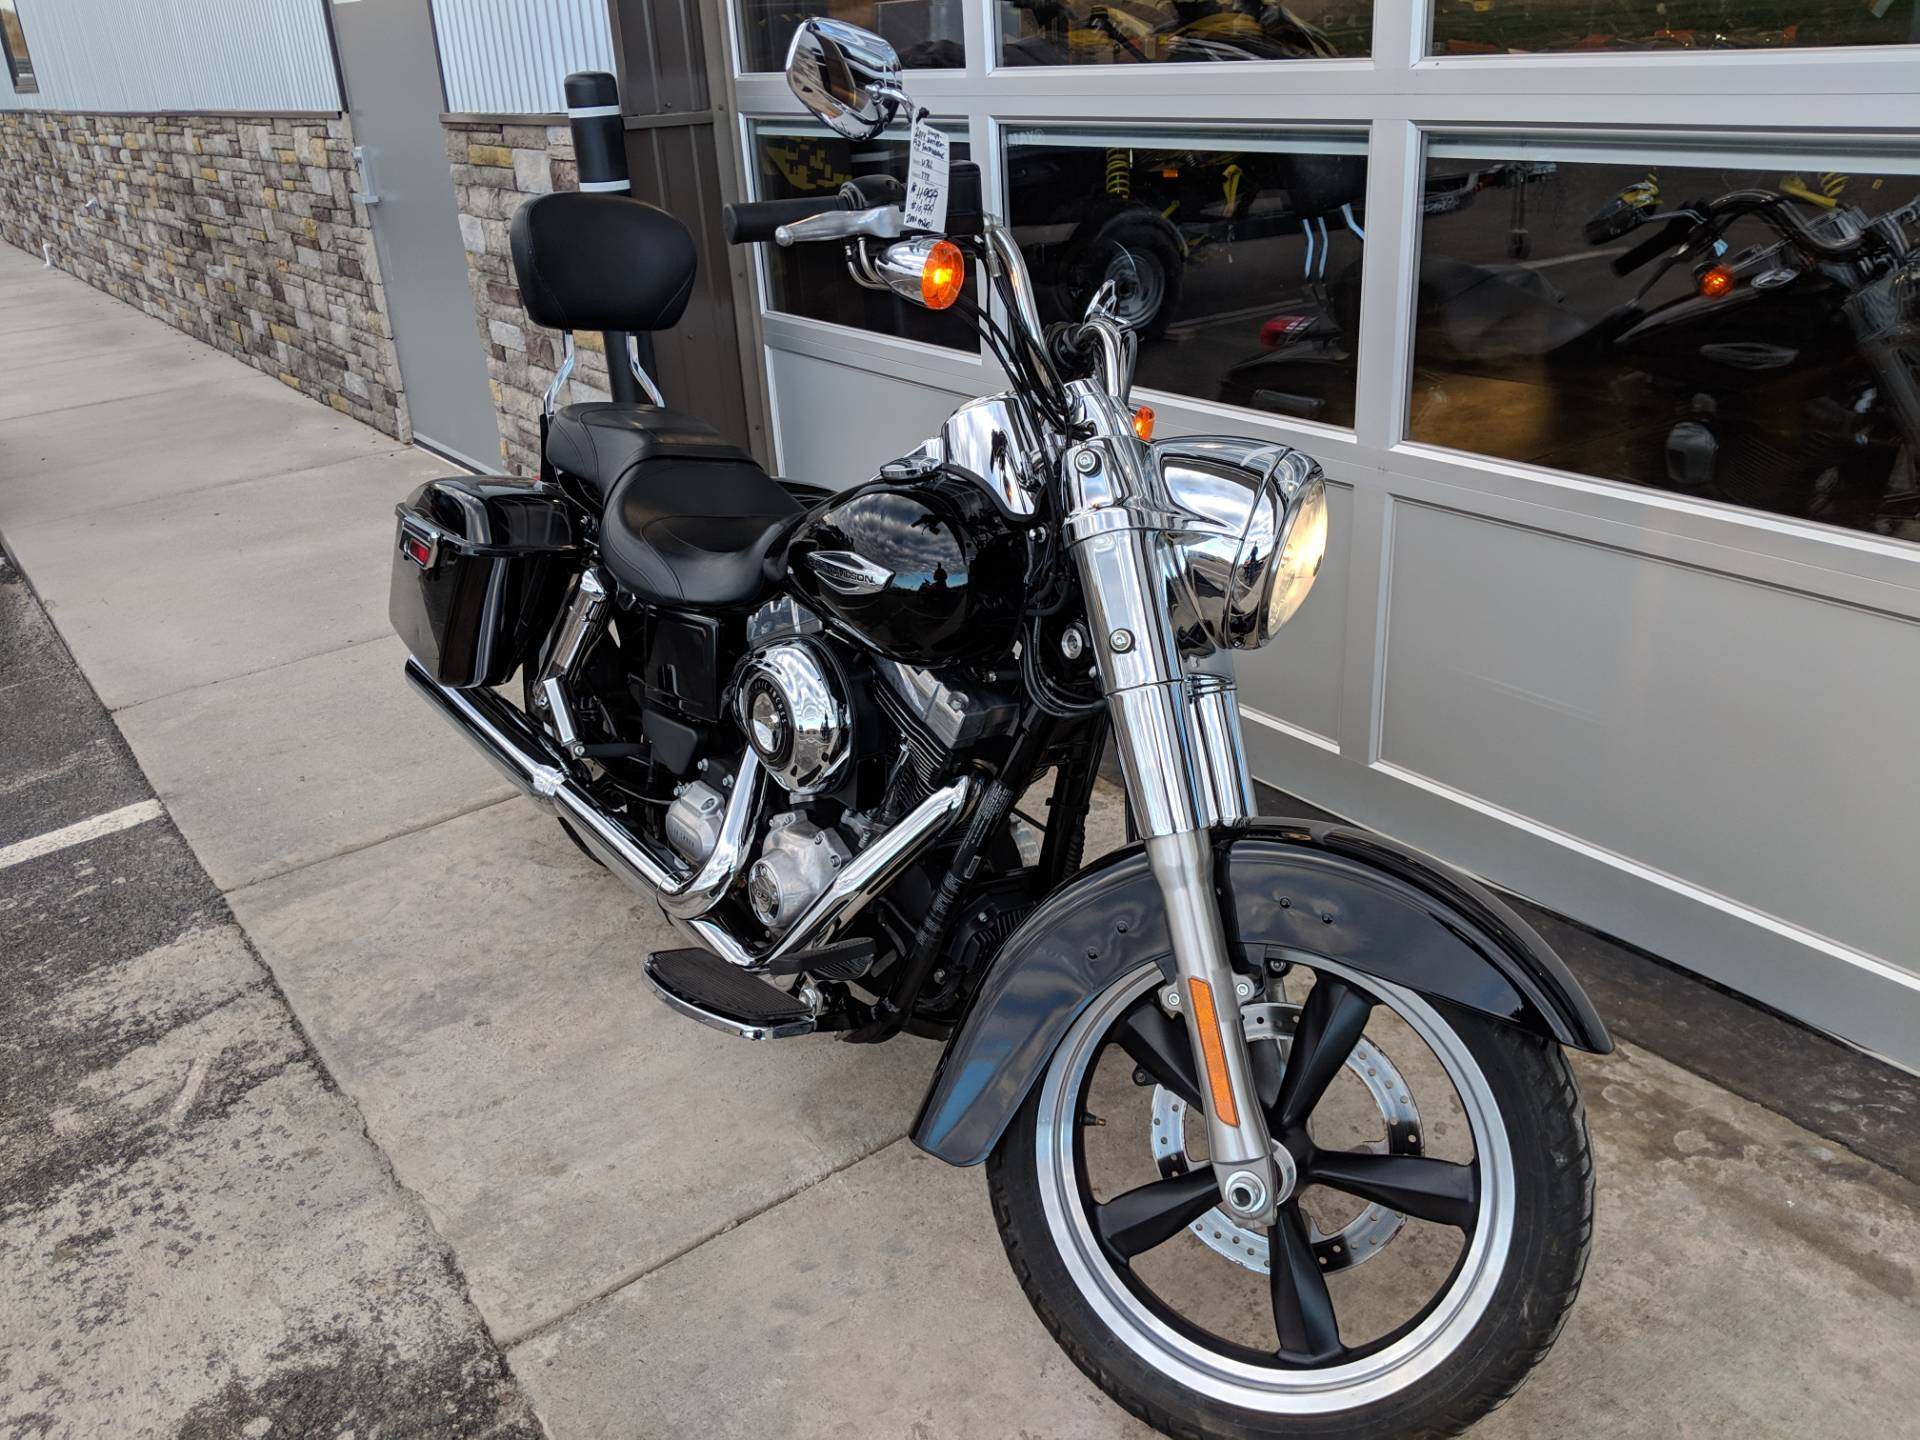 2014 Harley-Davidson Dyna Switchback 7